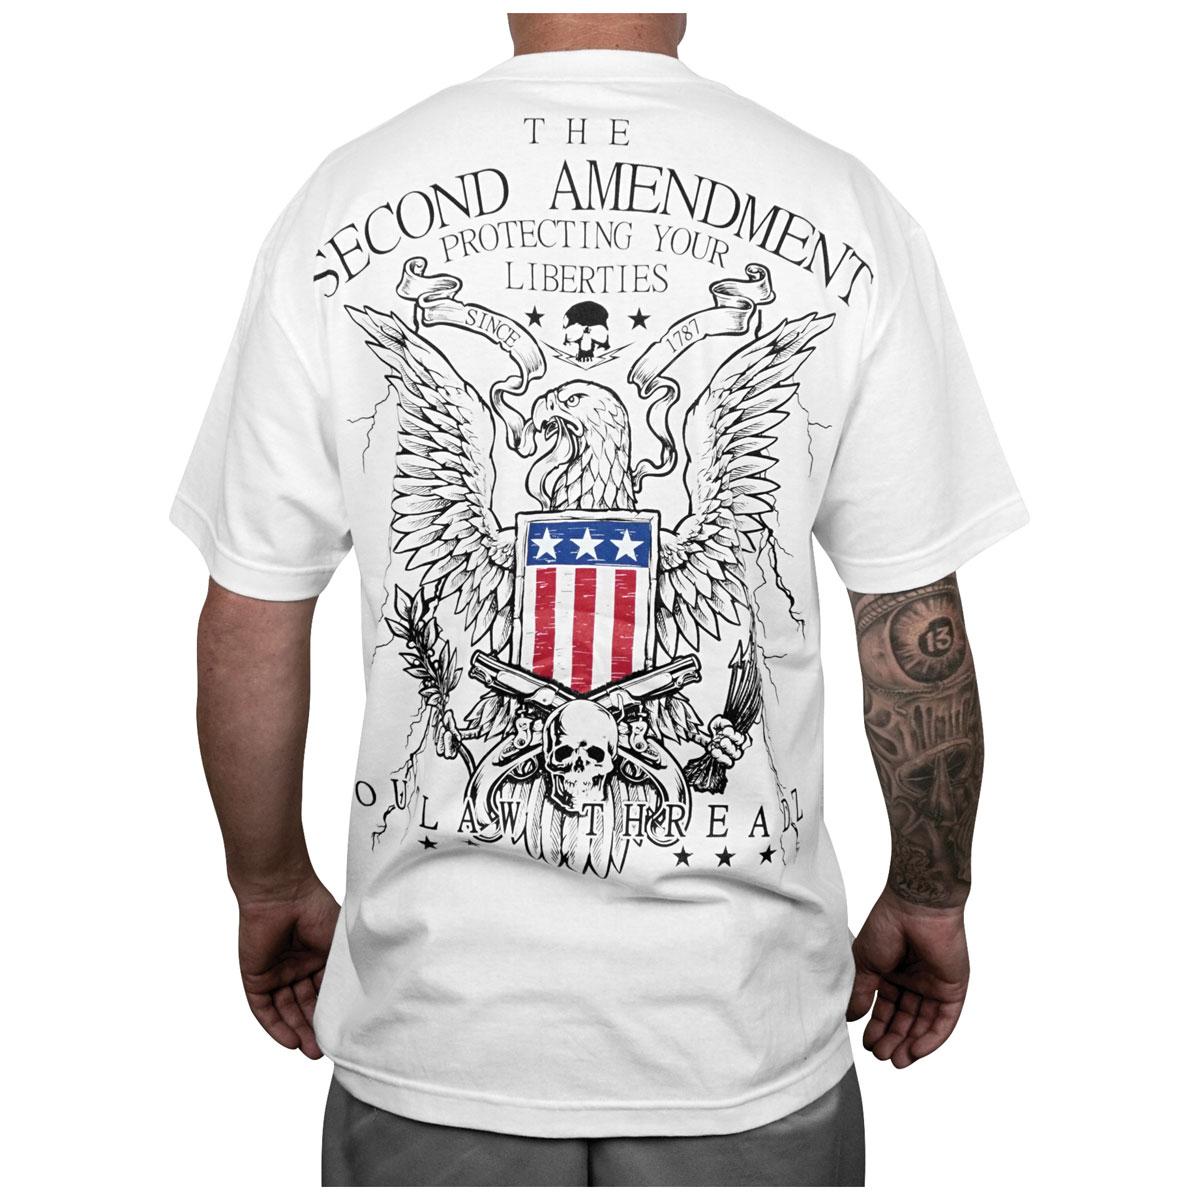 Outlaw Threadz Men's 2nd Amendment White T-Shirt